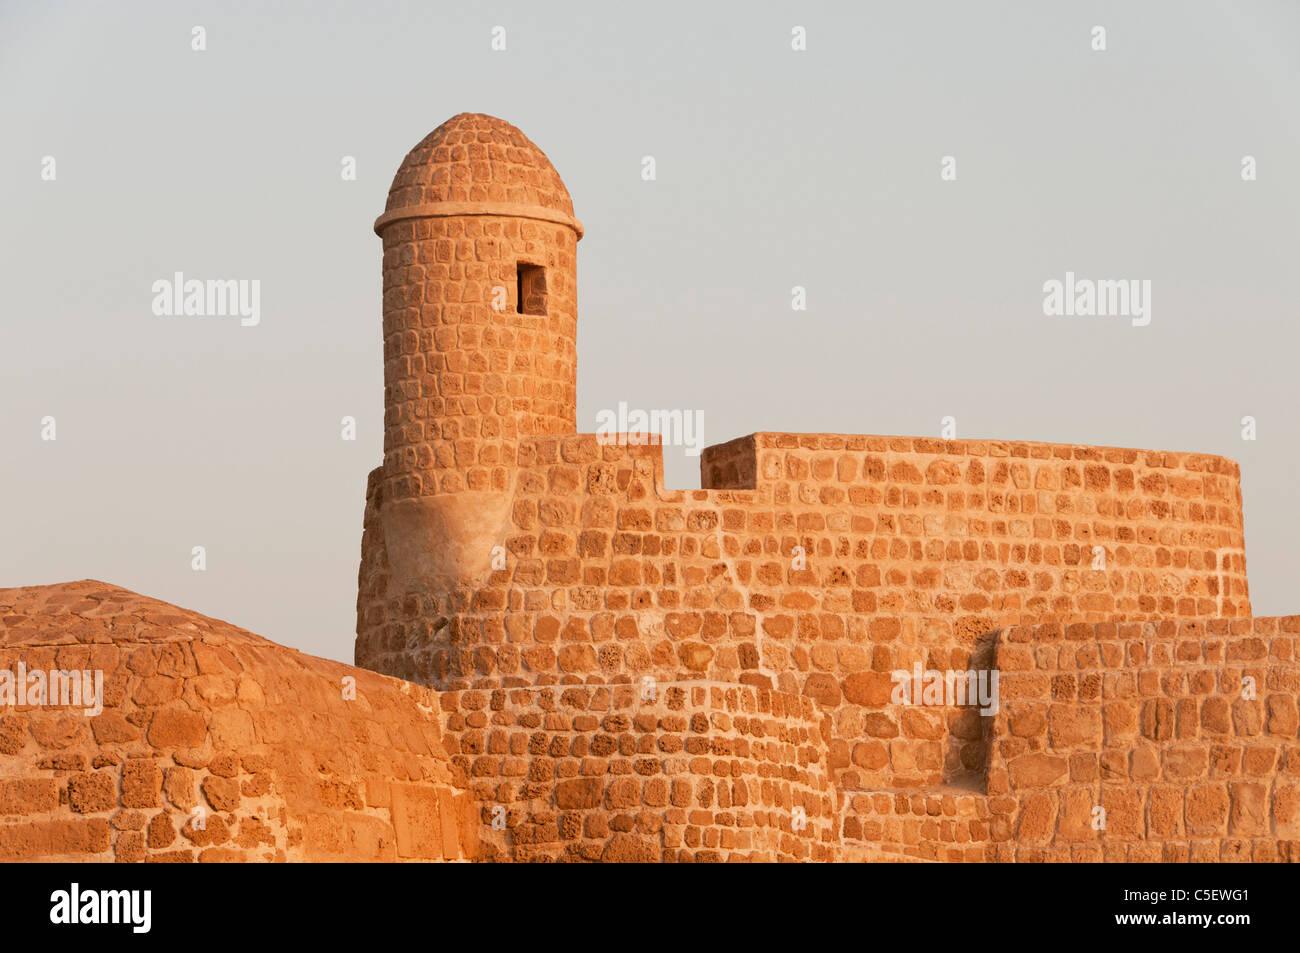 Elk204-1404 Bahrain, Bahrain Fort (Qala'at al Bahrain) 16th c, exterior walls and guard tower - Stock Image